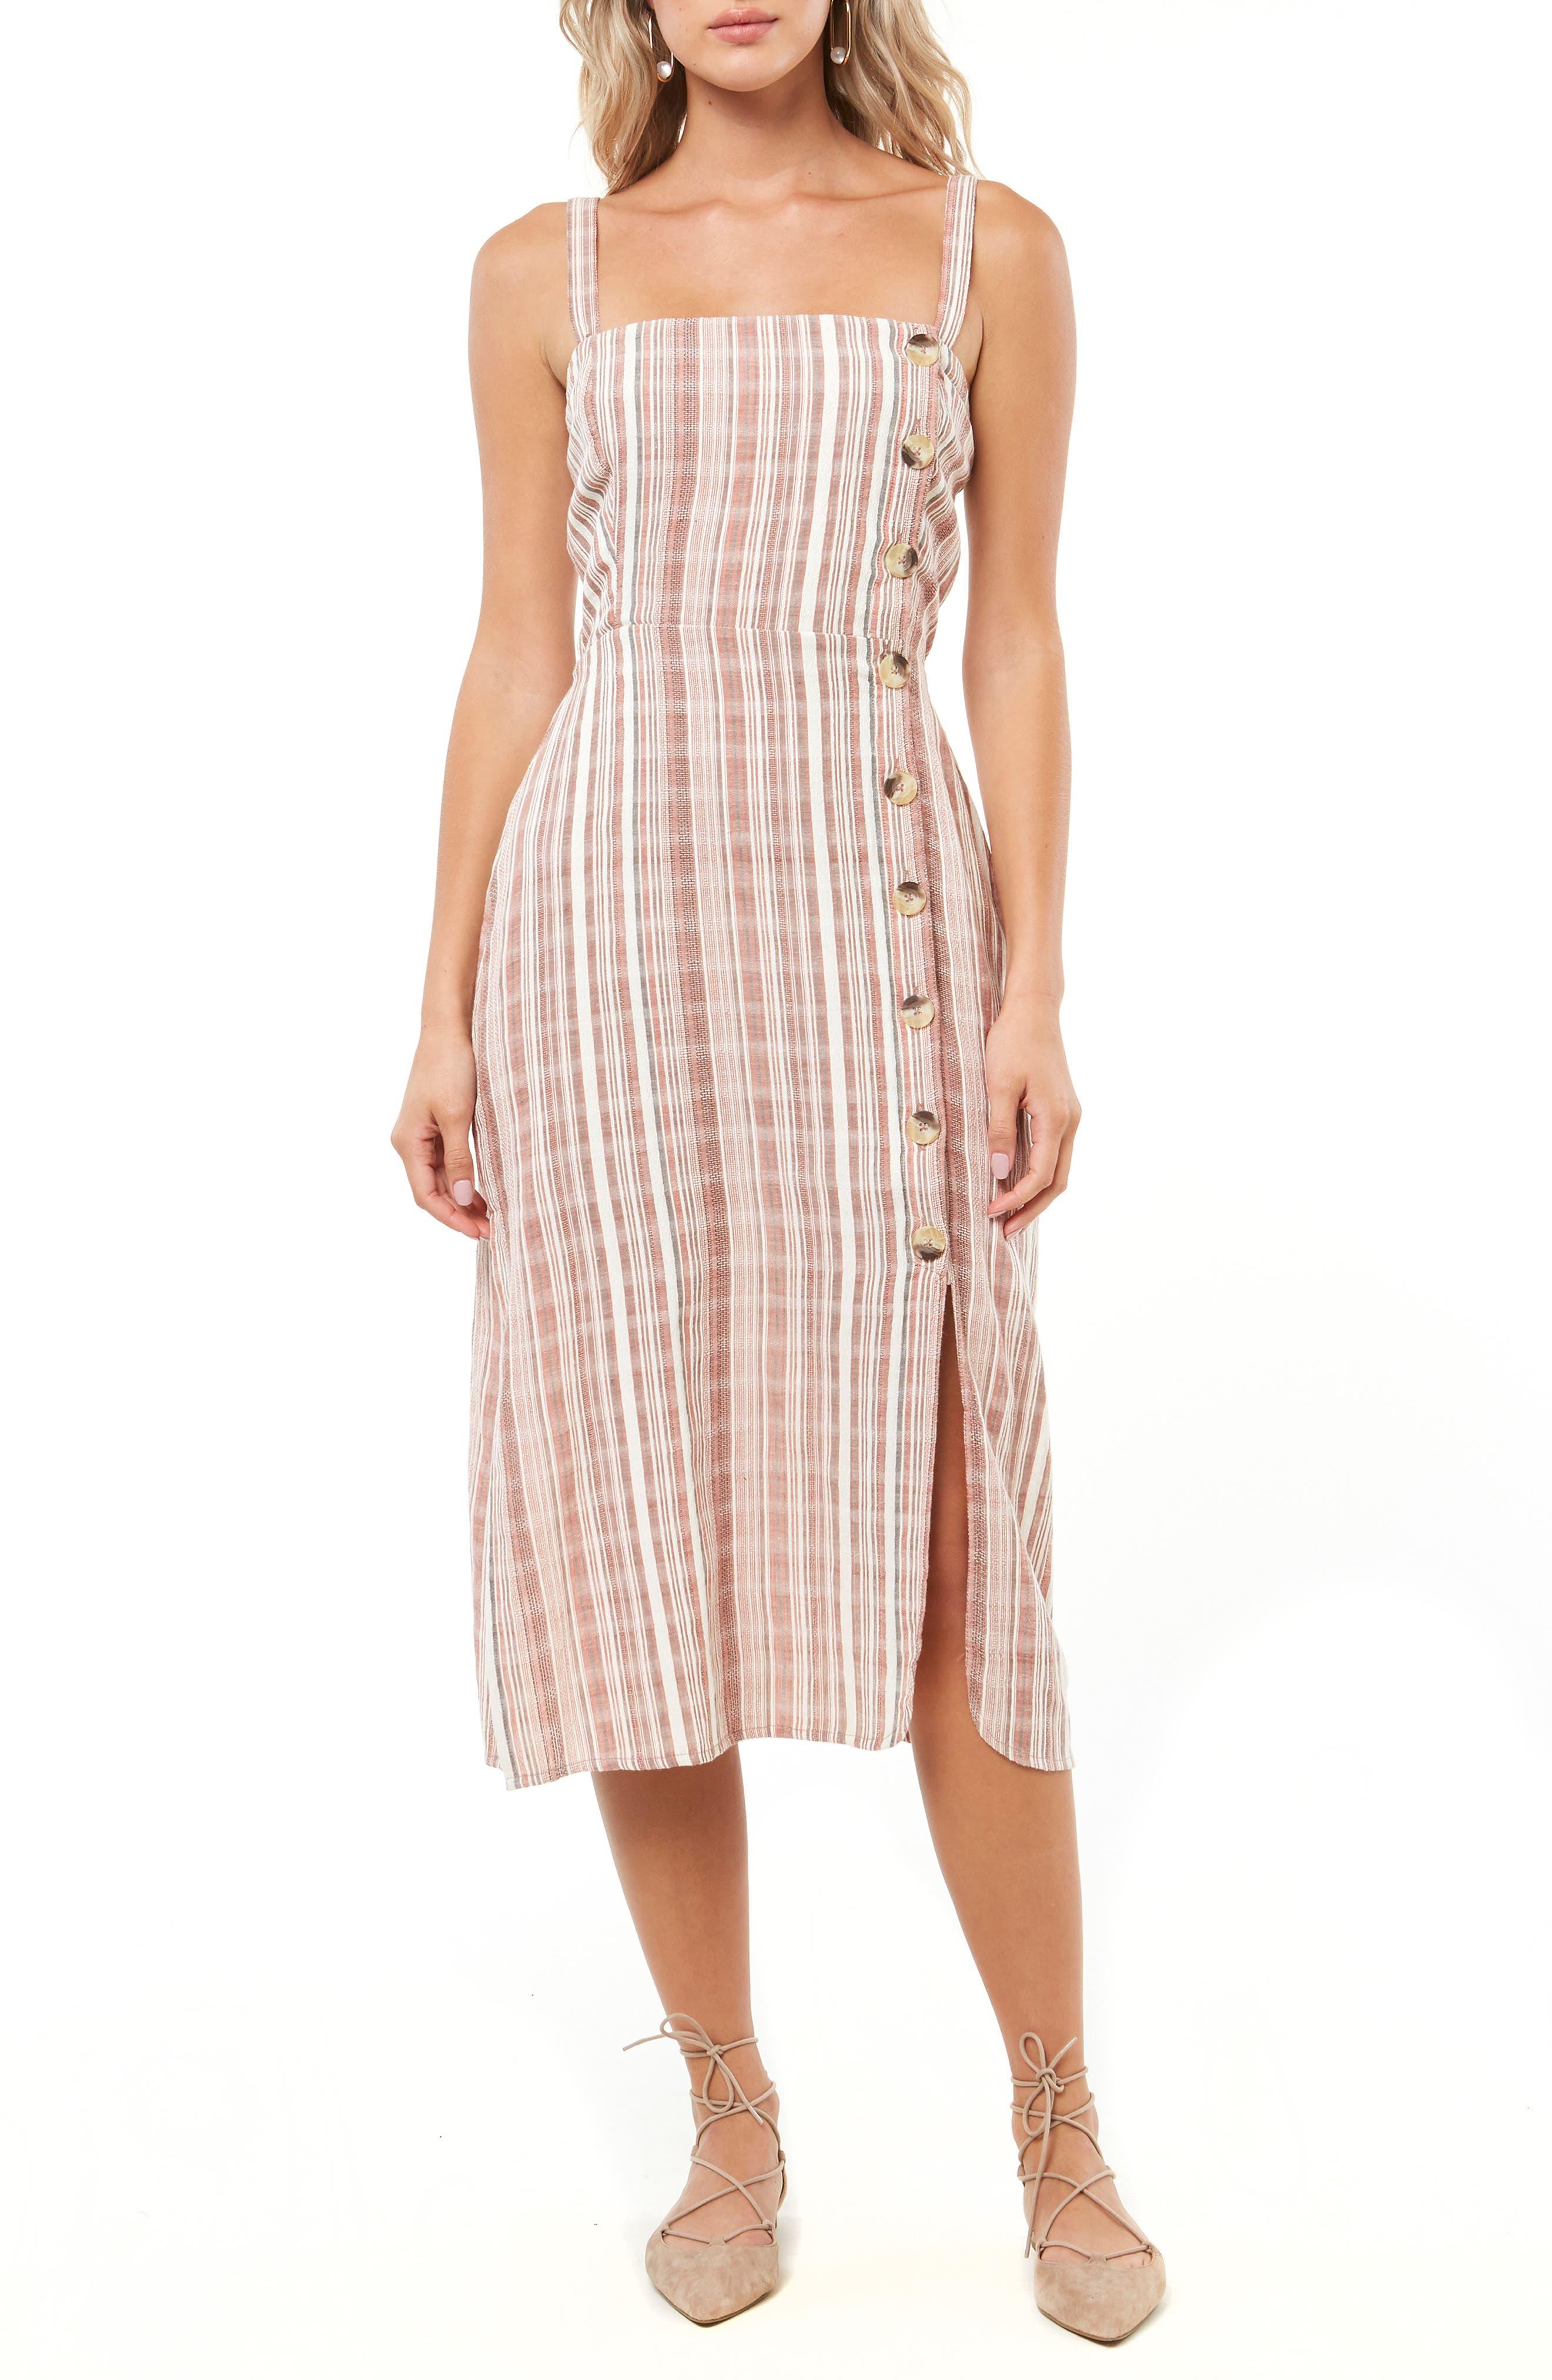 "Amalfi Stripe Woven Midi Dress40"",                             Main thumbnail 1, color,                             ETRUSCAN RED"